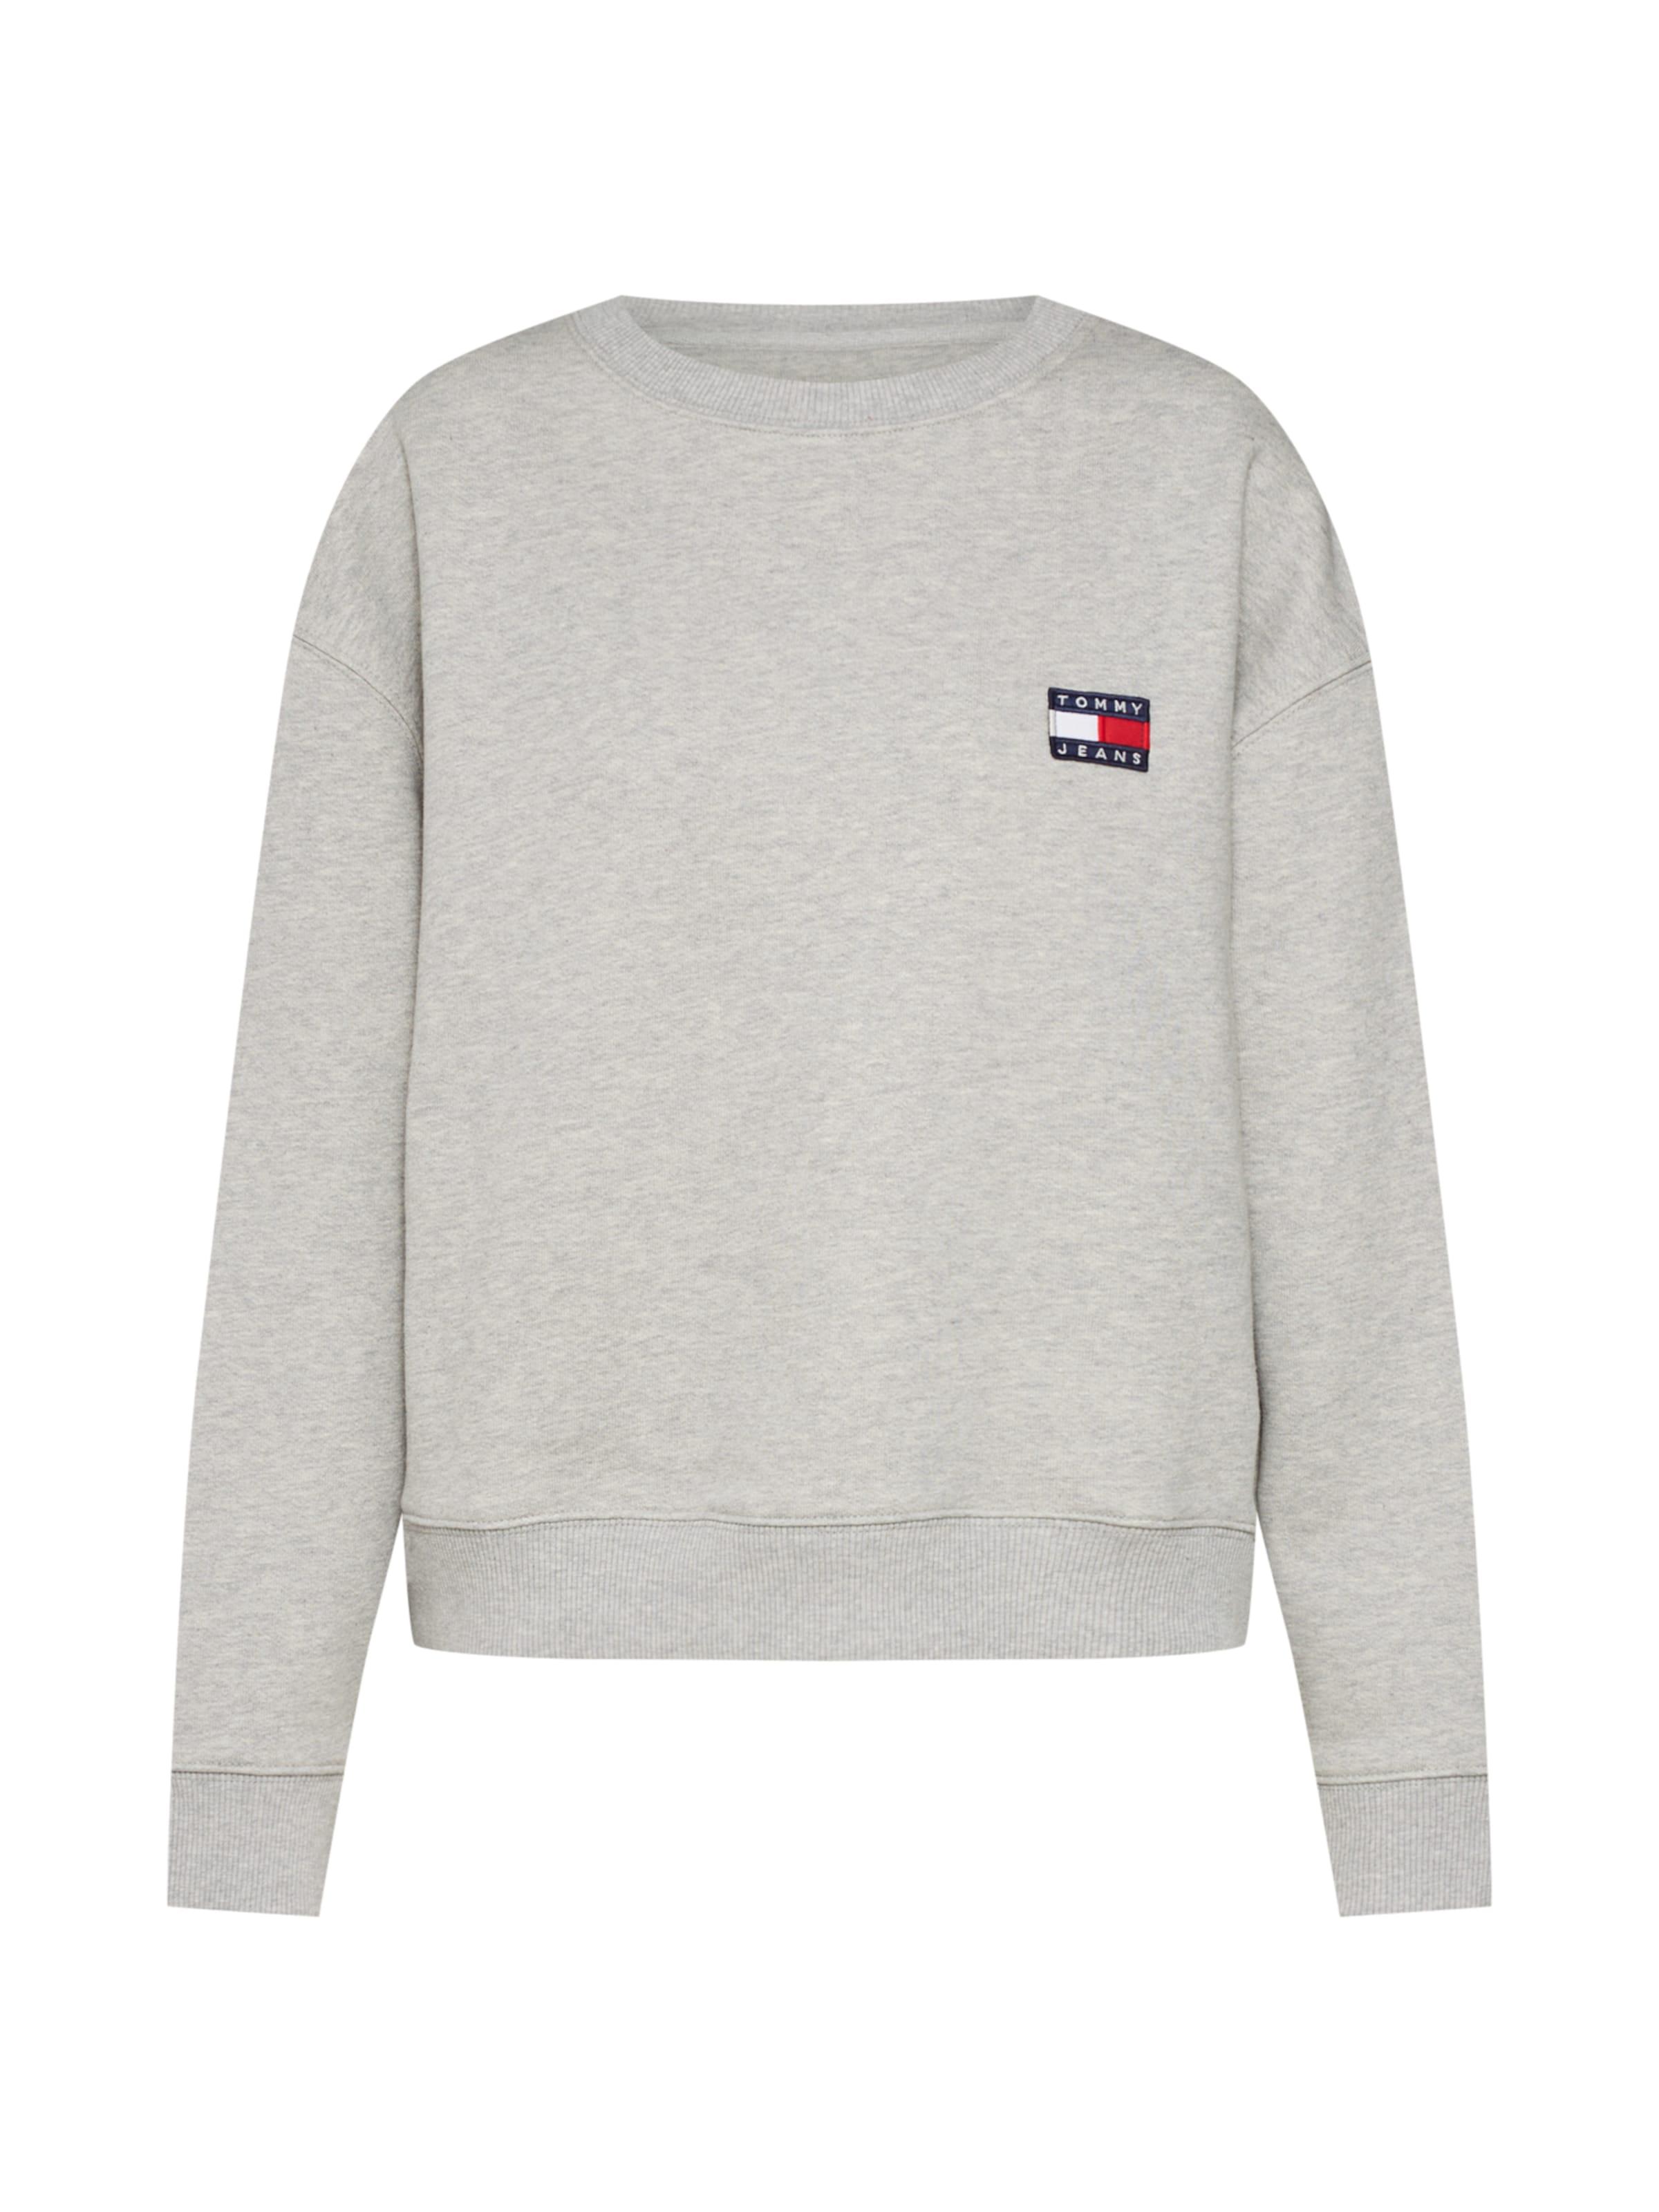 Jeans 'tommy Tommy Badge Crew' Hellgrau Sweatshirt In kZiTXPOu